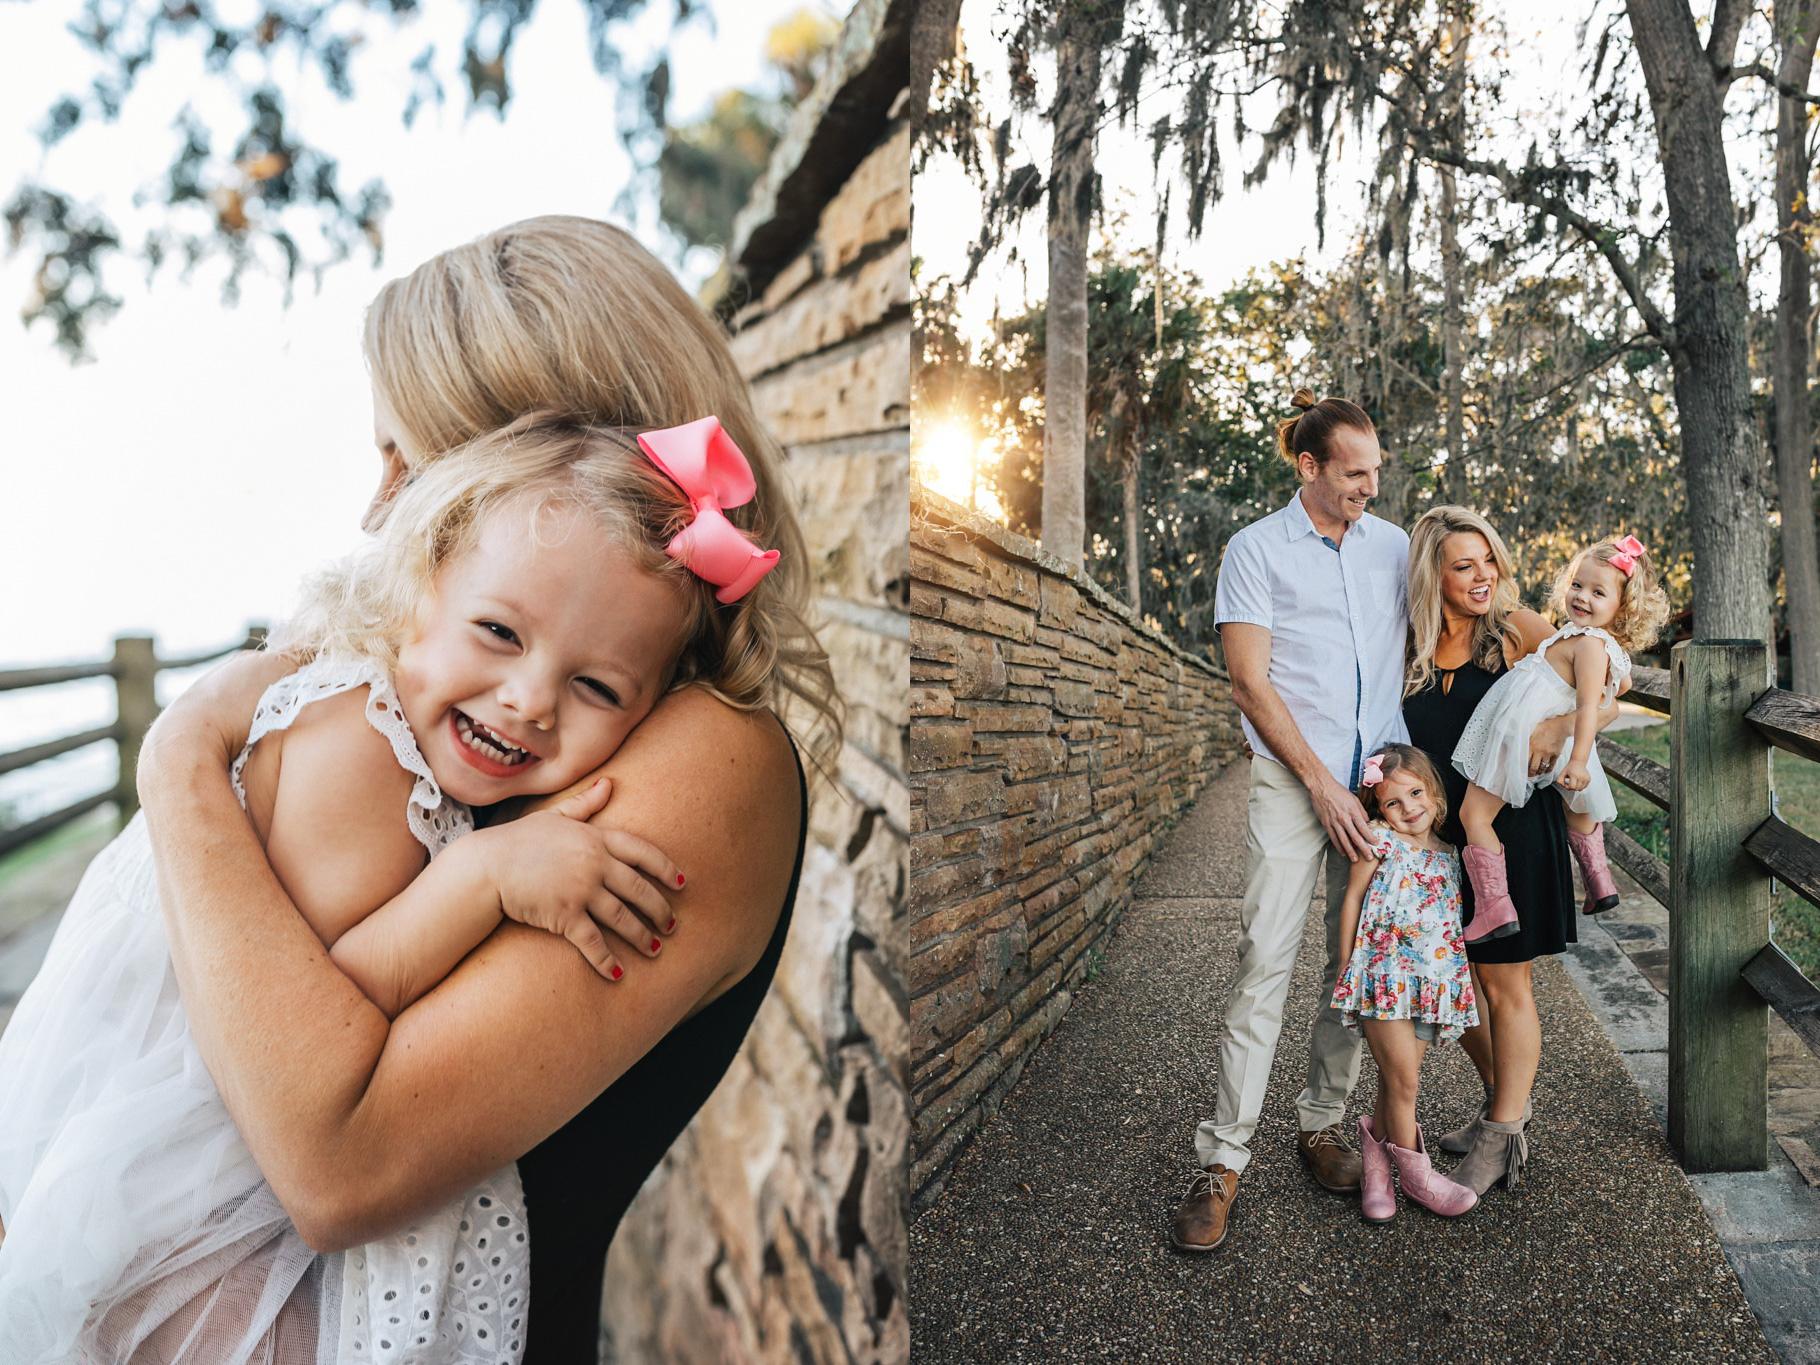 Tampa Family Photographer_Lesley for blog vertical 2.jpg